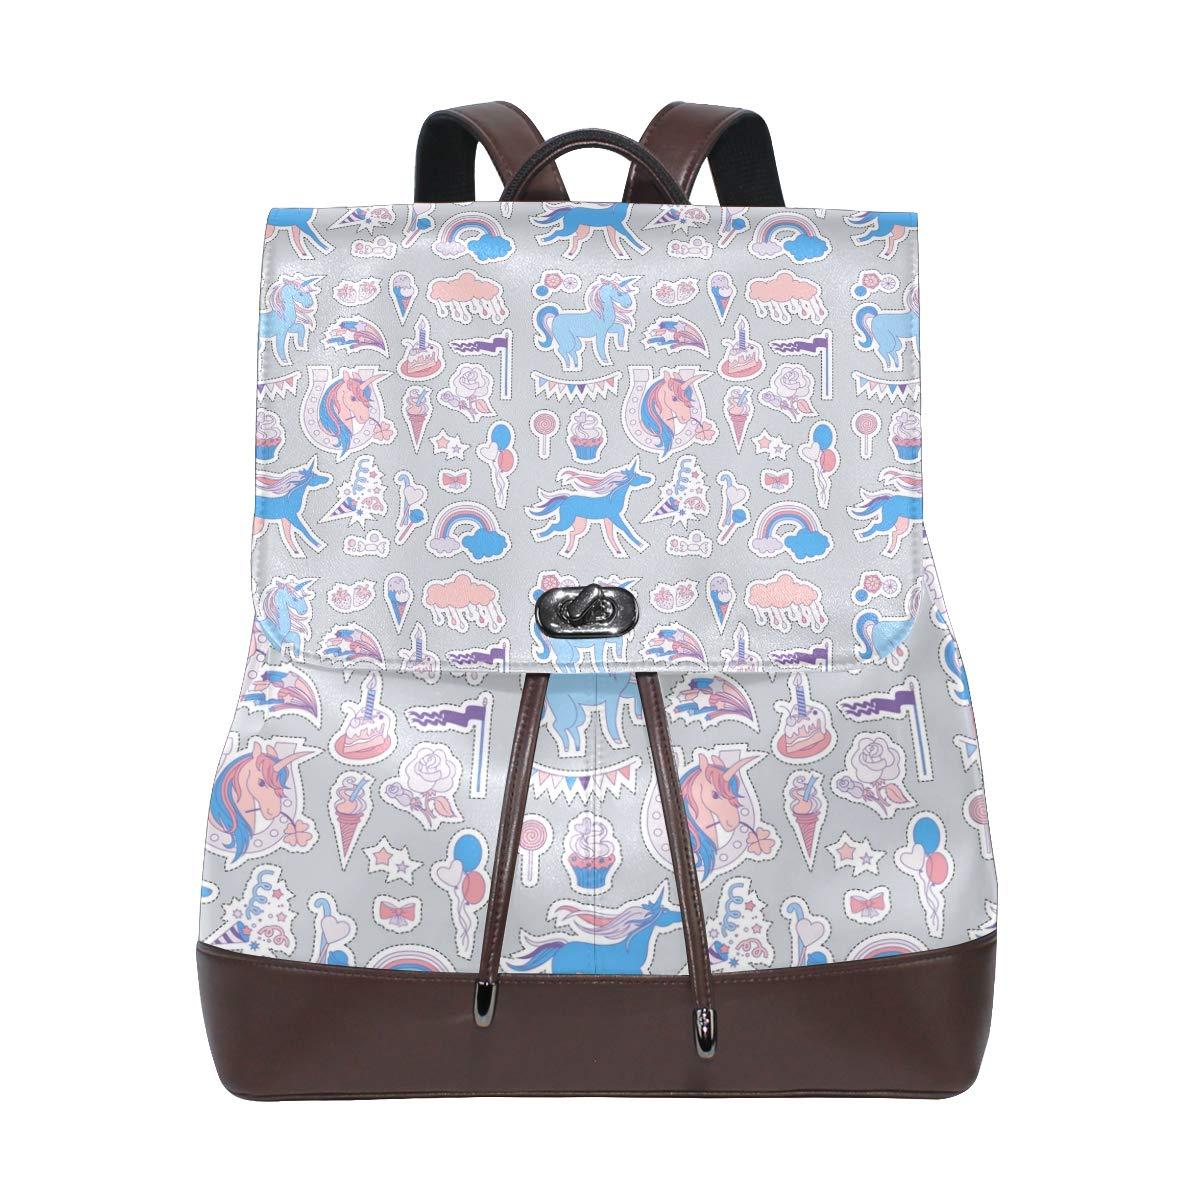 Leather Unicorn Multicolor Backpack Daypack Bag Women